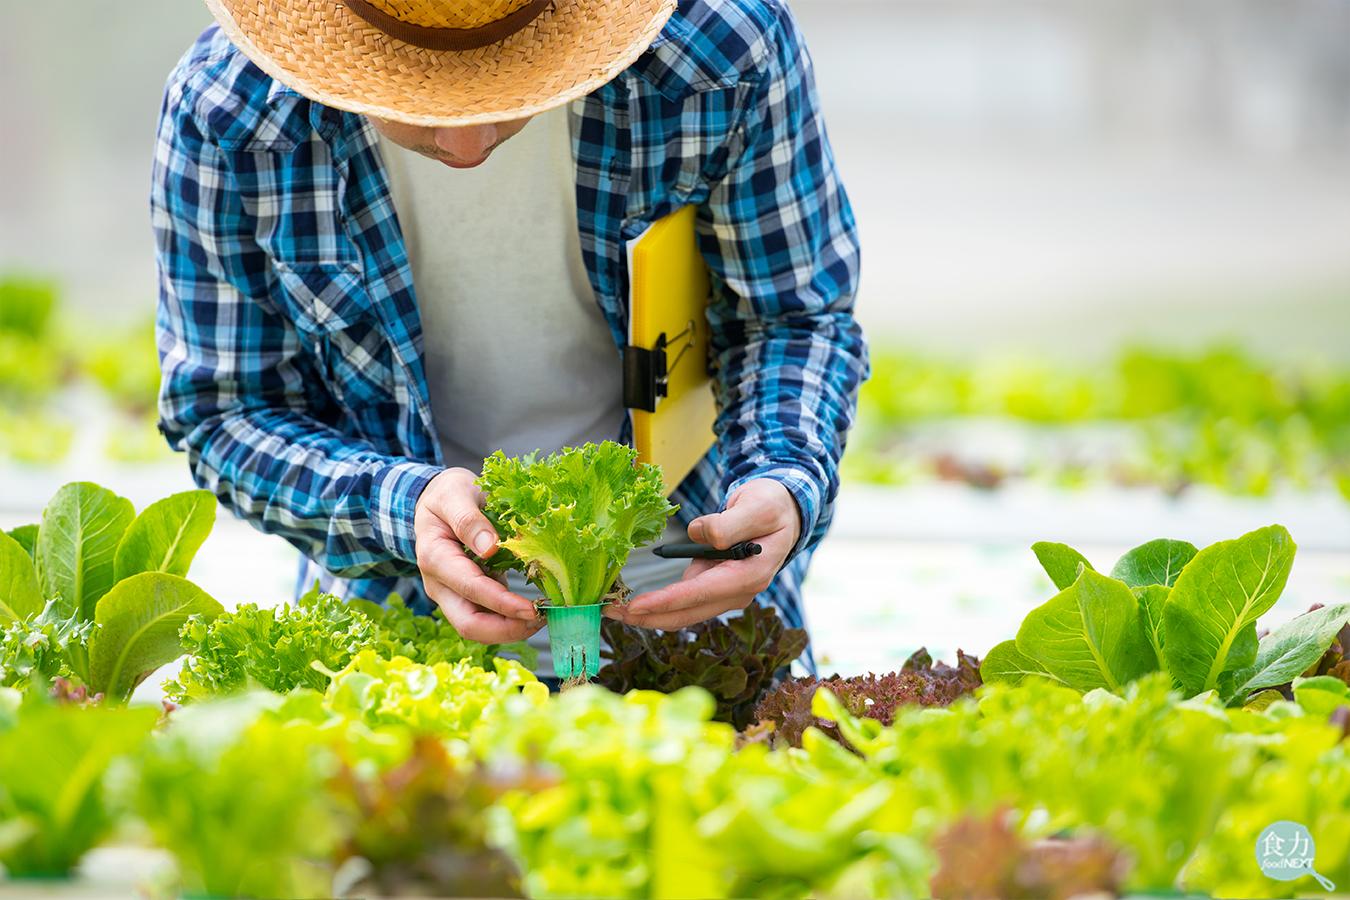 【TGA x 食力】有機友善耕作僅占全台1% 台灣永續農業還有一大段路要走